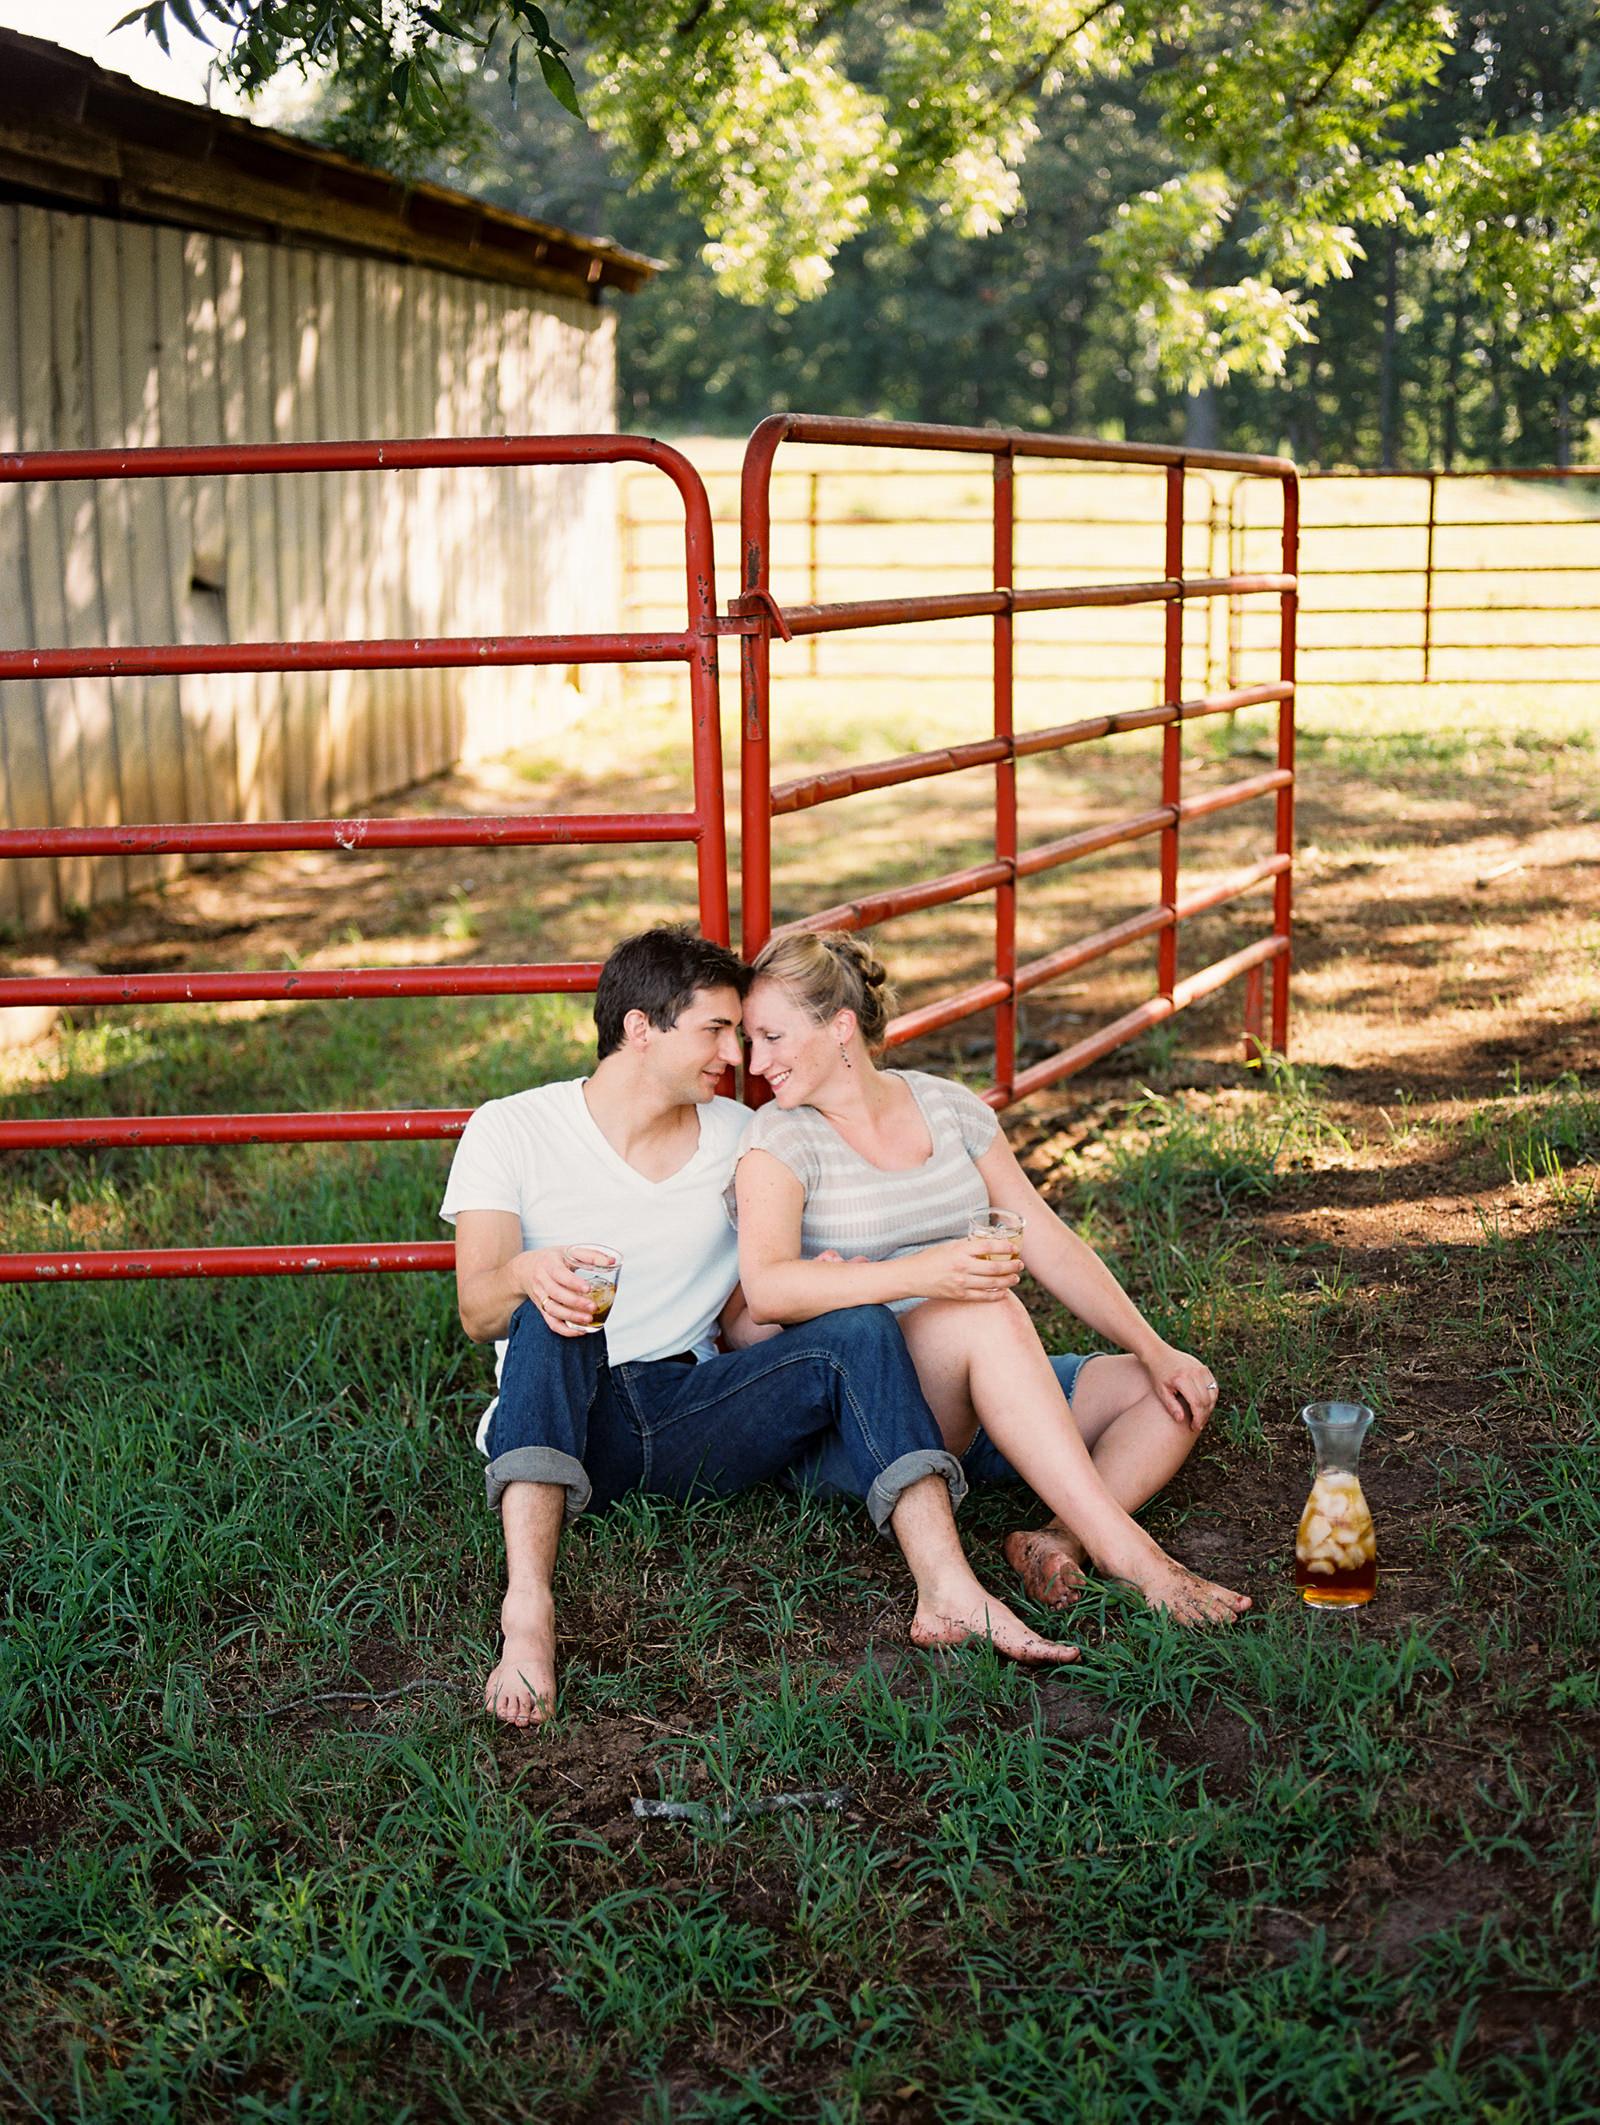 021-maternity-fine-art-film-lifestyle-photography.jpg